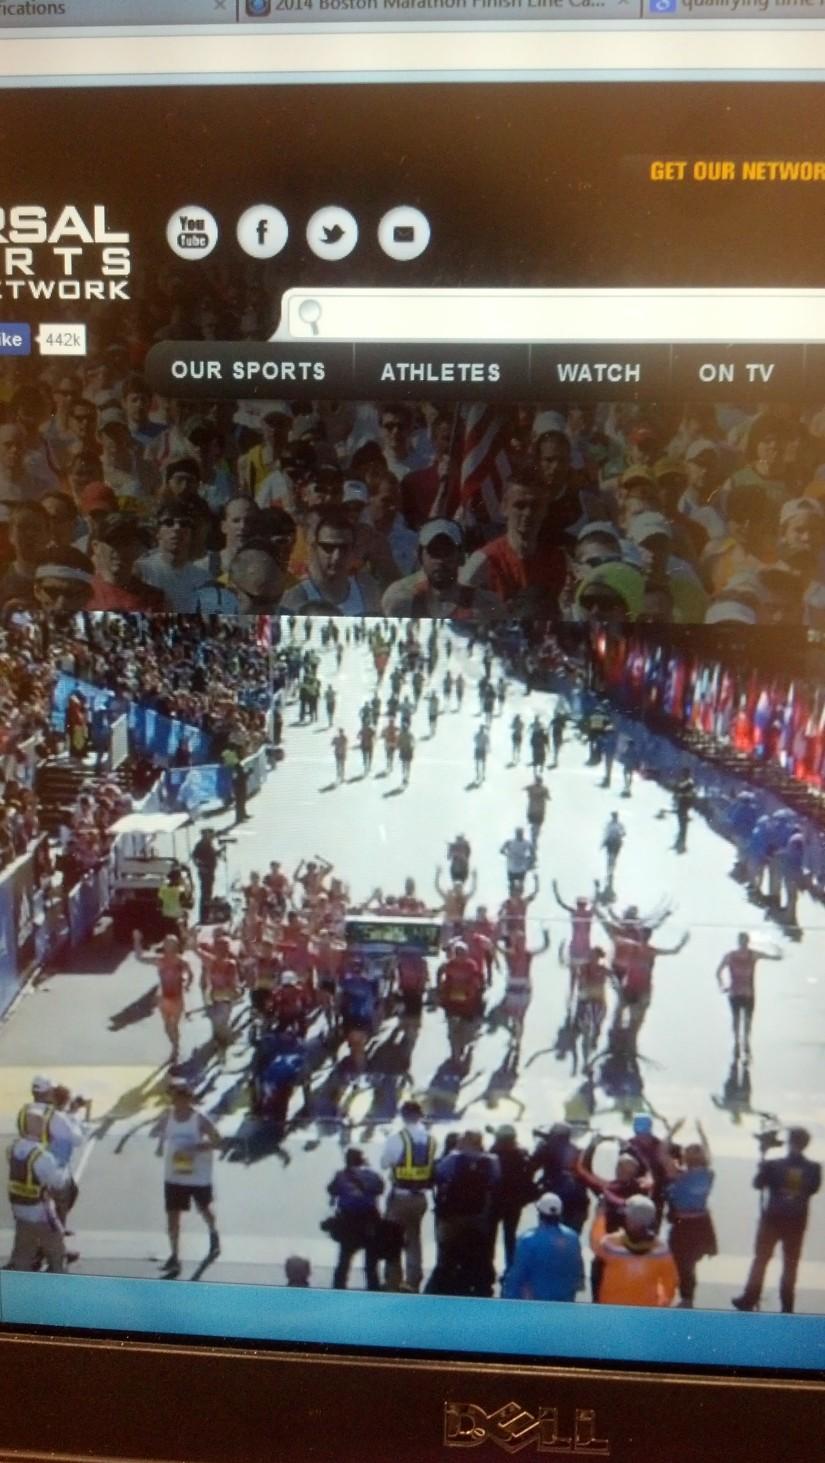 Team Hoyt's final finish at the Boston Marathon :-}